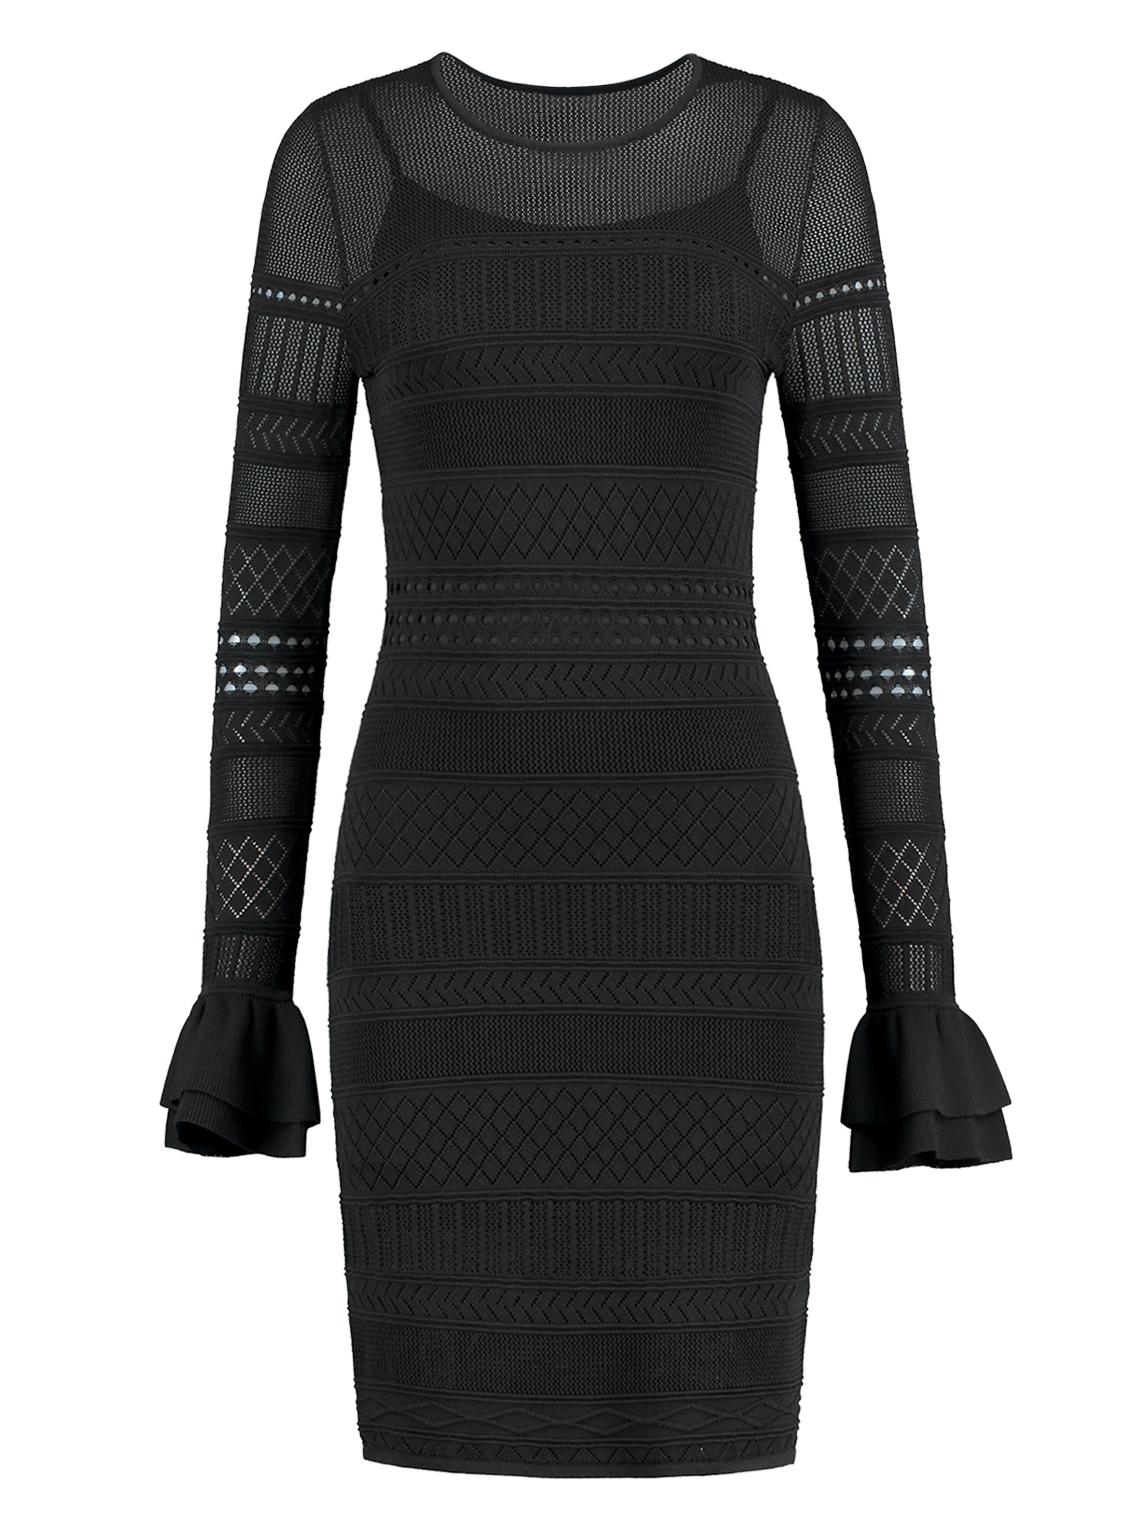 Zwarte dames jurk Nikkie Jolida Dress - N7-691 1901 9000